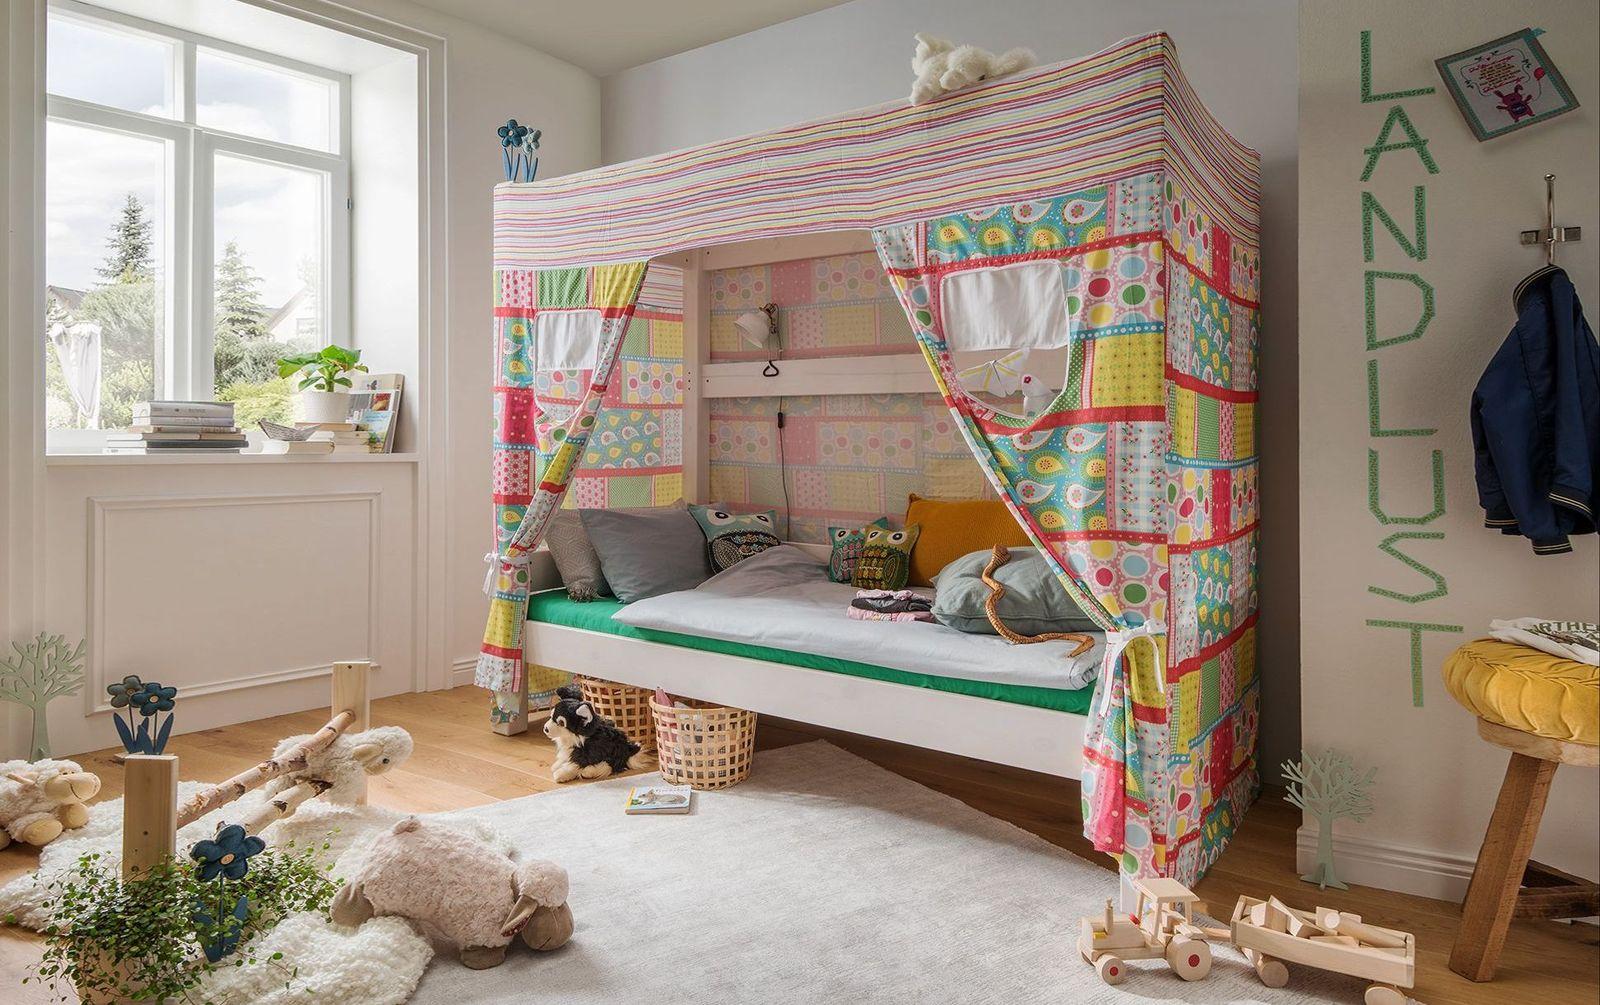 Himmelbett Kids Dreams aus massiver Kiefer